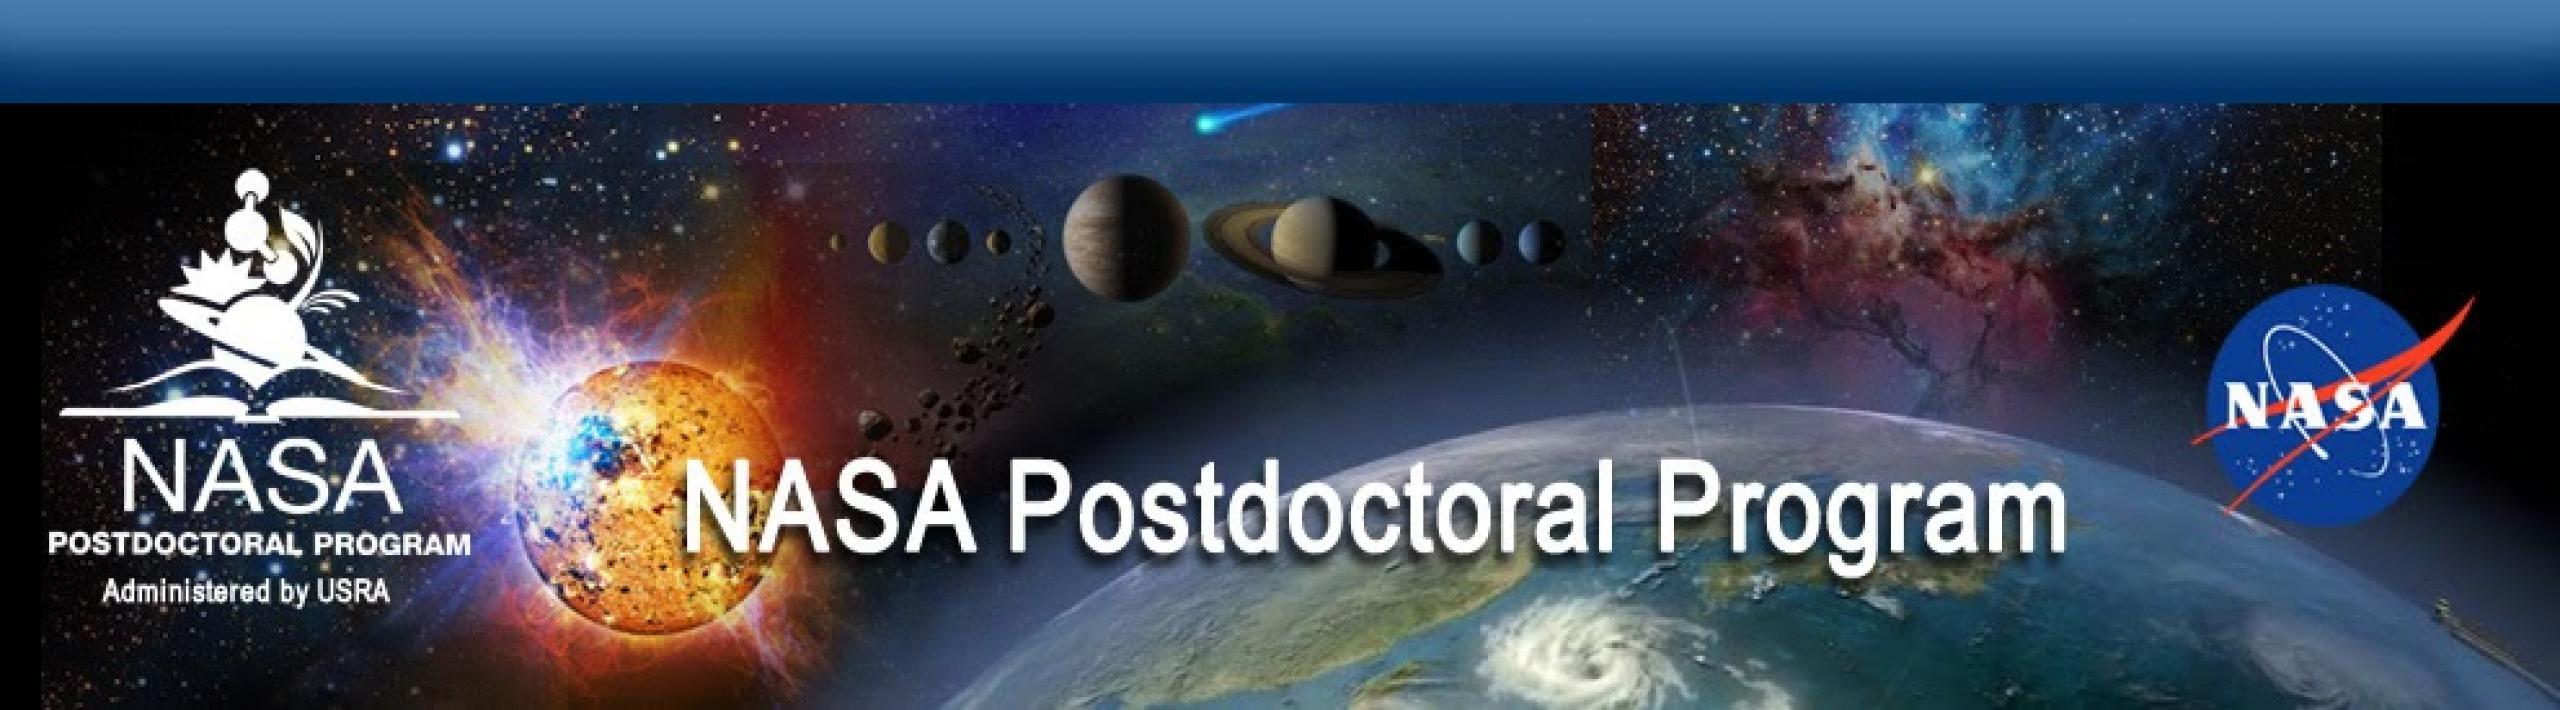 NASA Postdoctoral collage banner